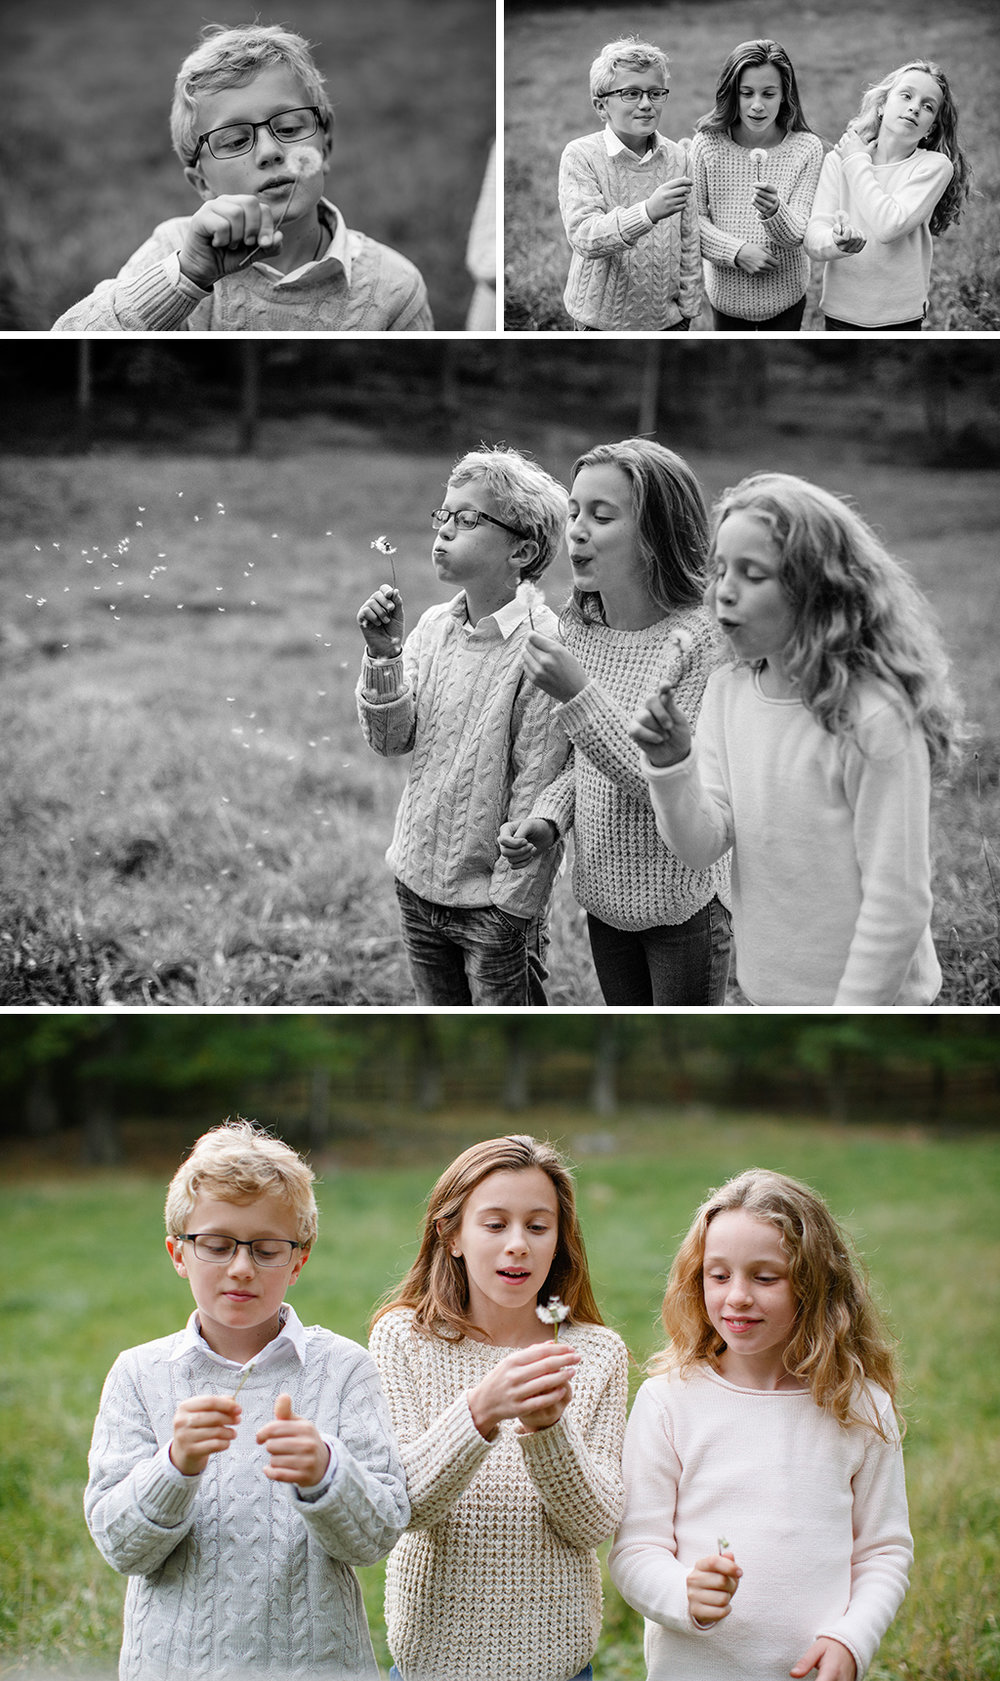 Familjefotografering_i-Stockholm_Lifestyle-familjefotograf-Anna-Sandstrom_18.jpg